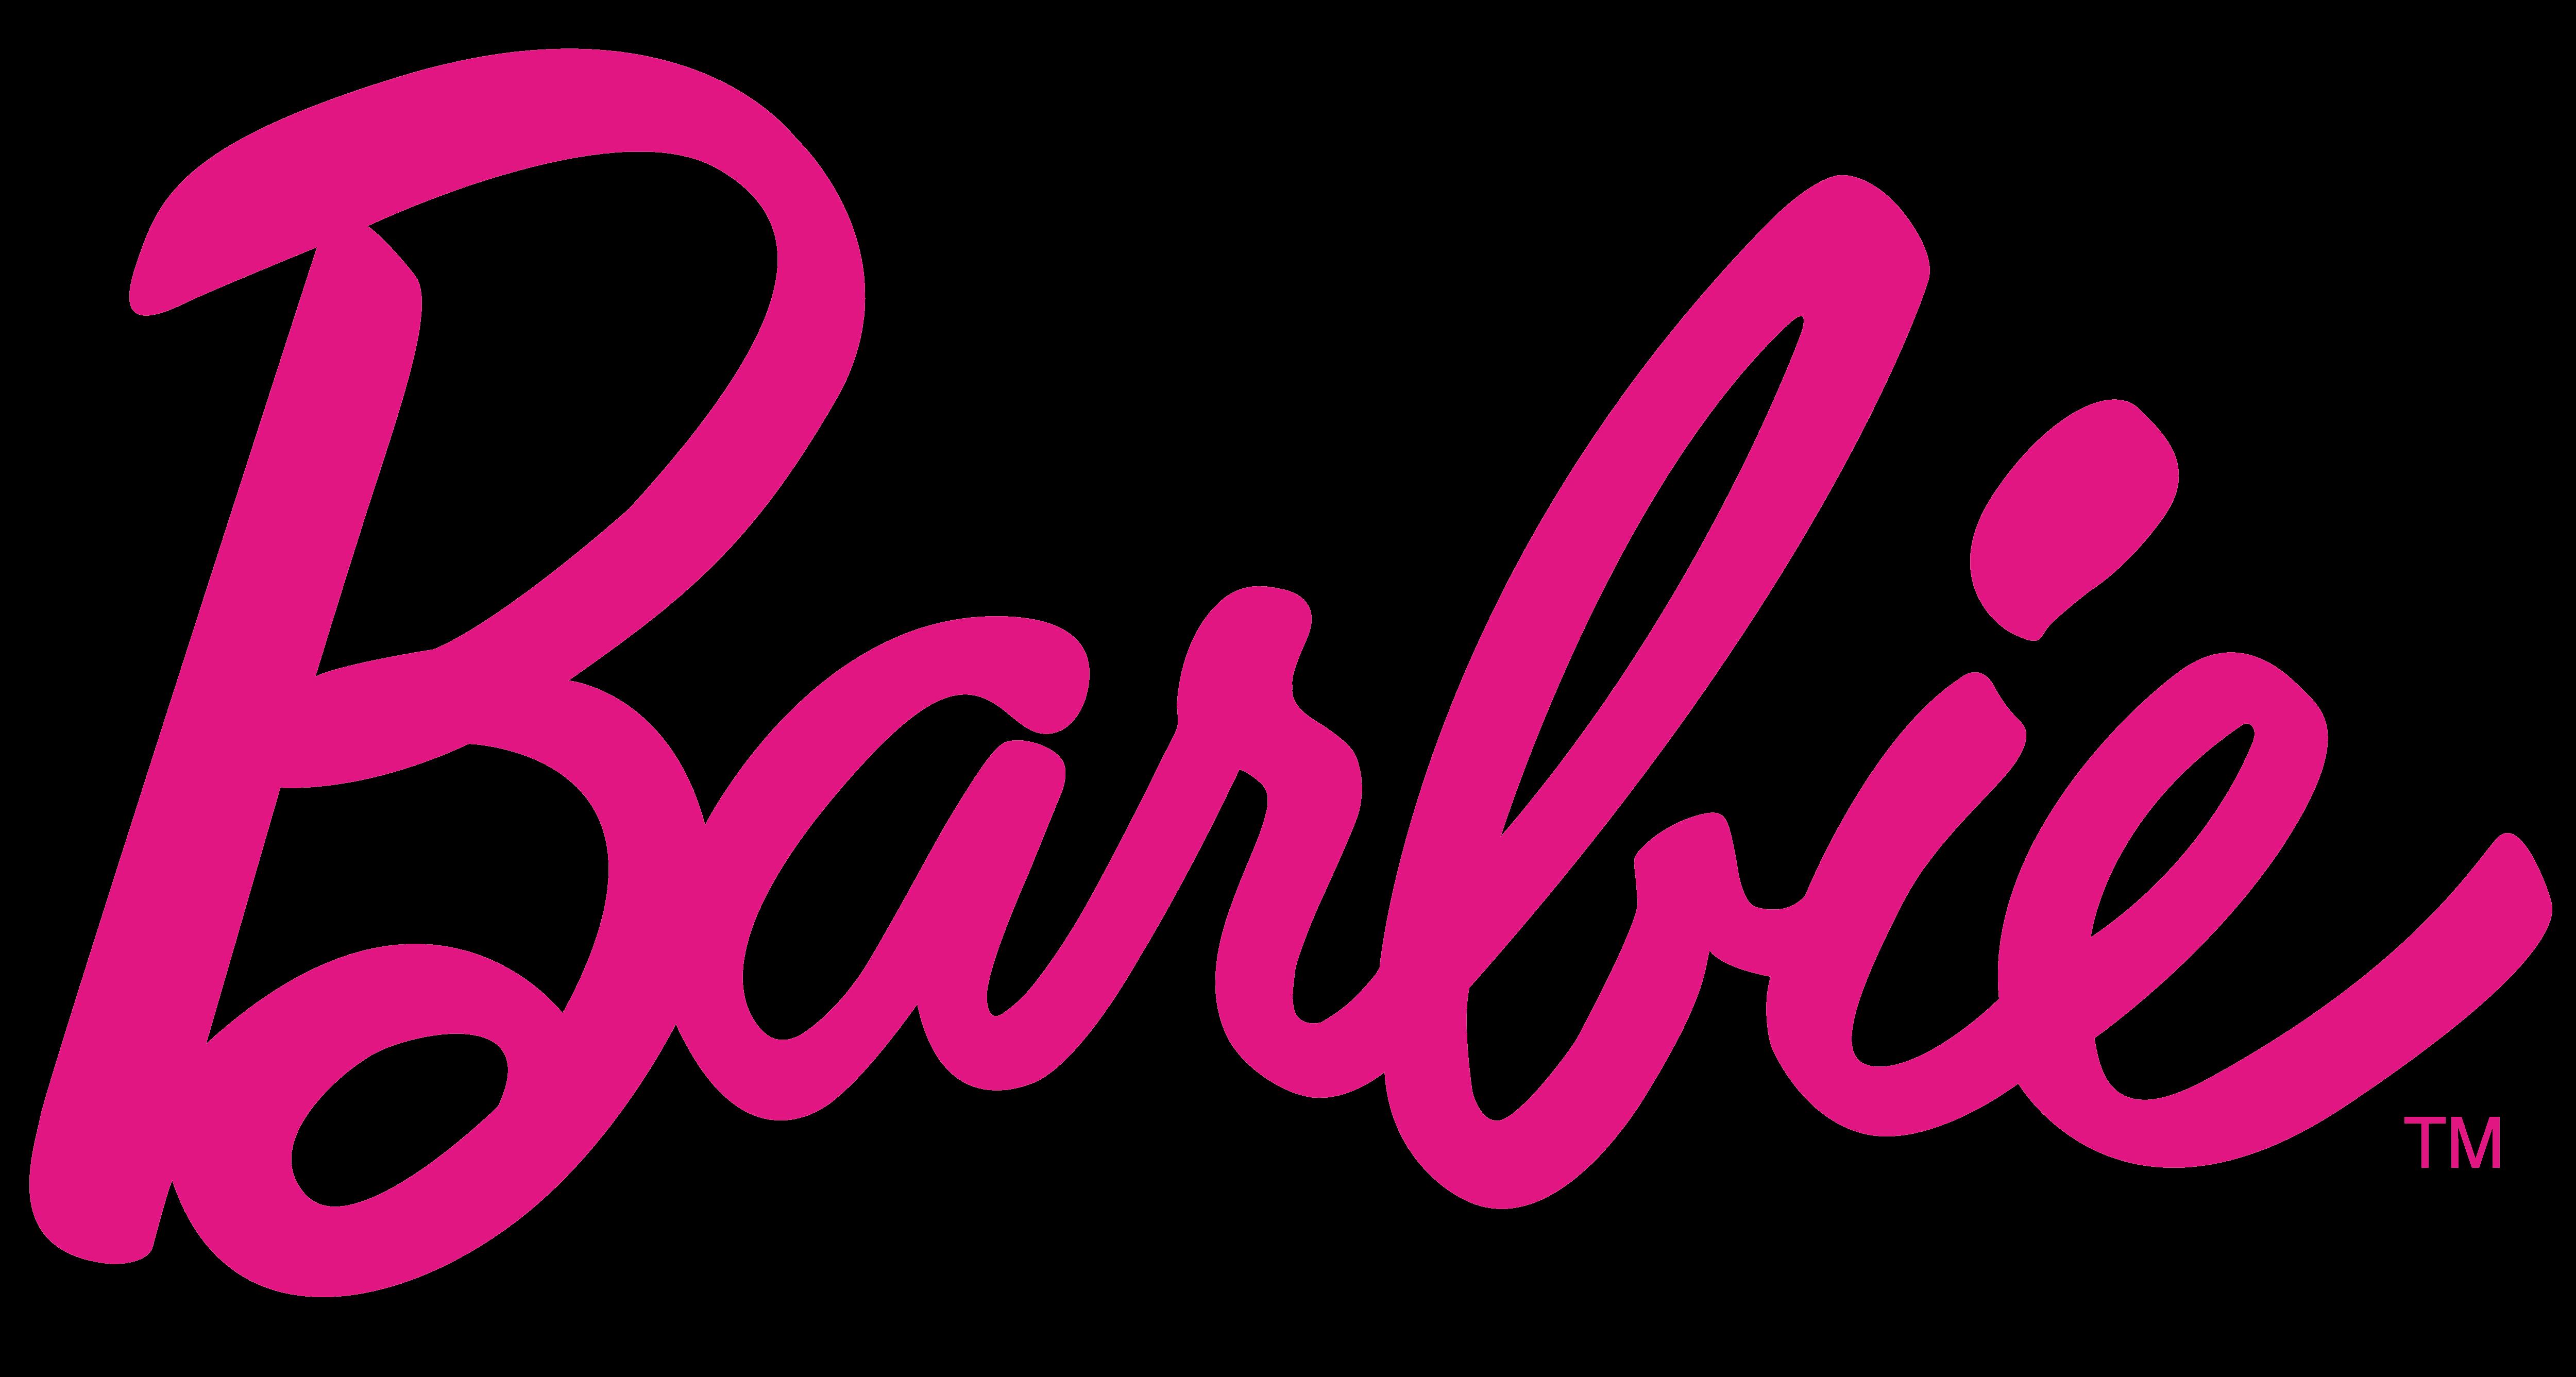 Image result for barbie logo บาร์บี้, วอลเปเปอร์